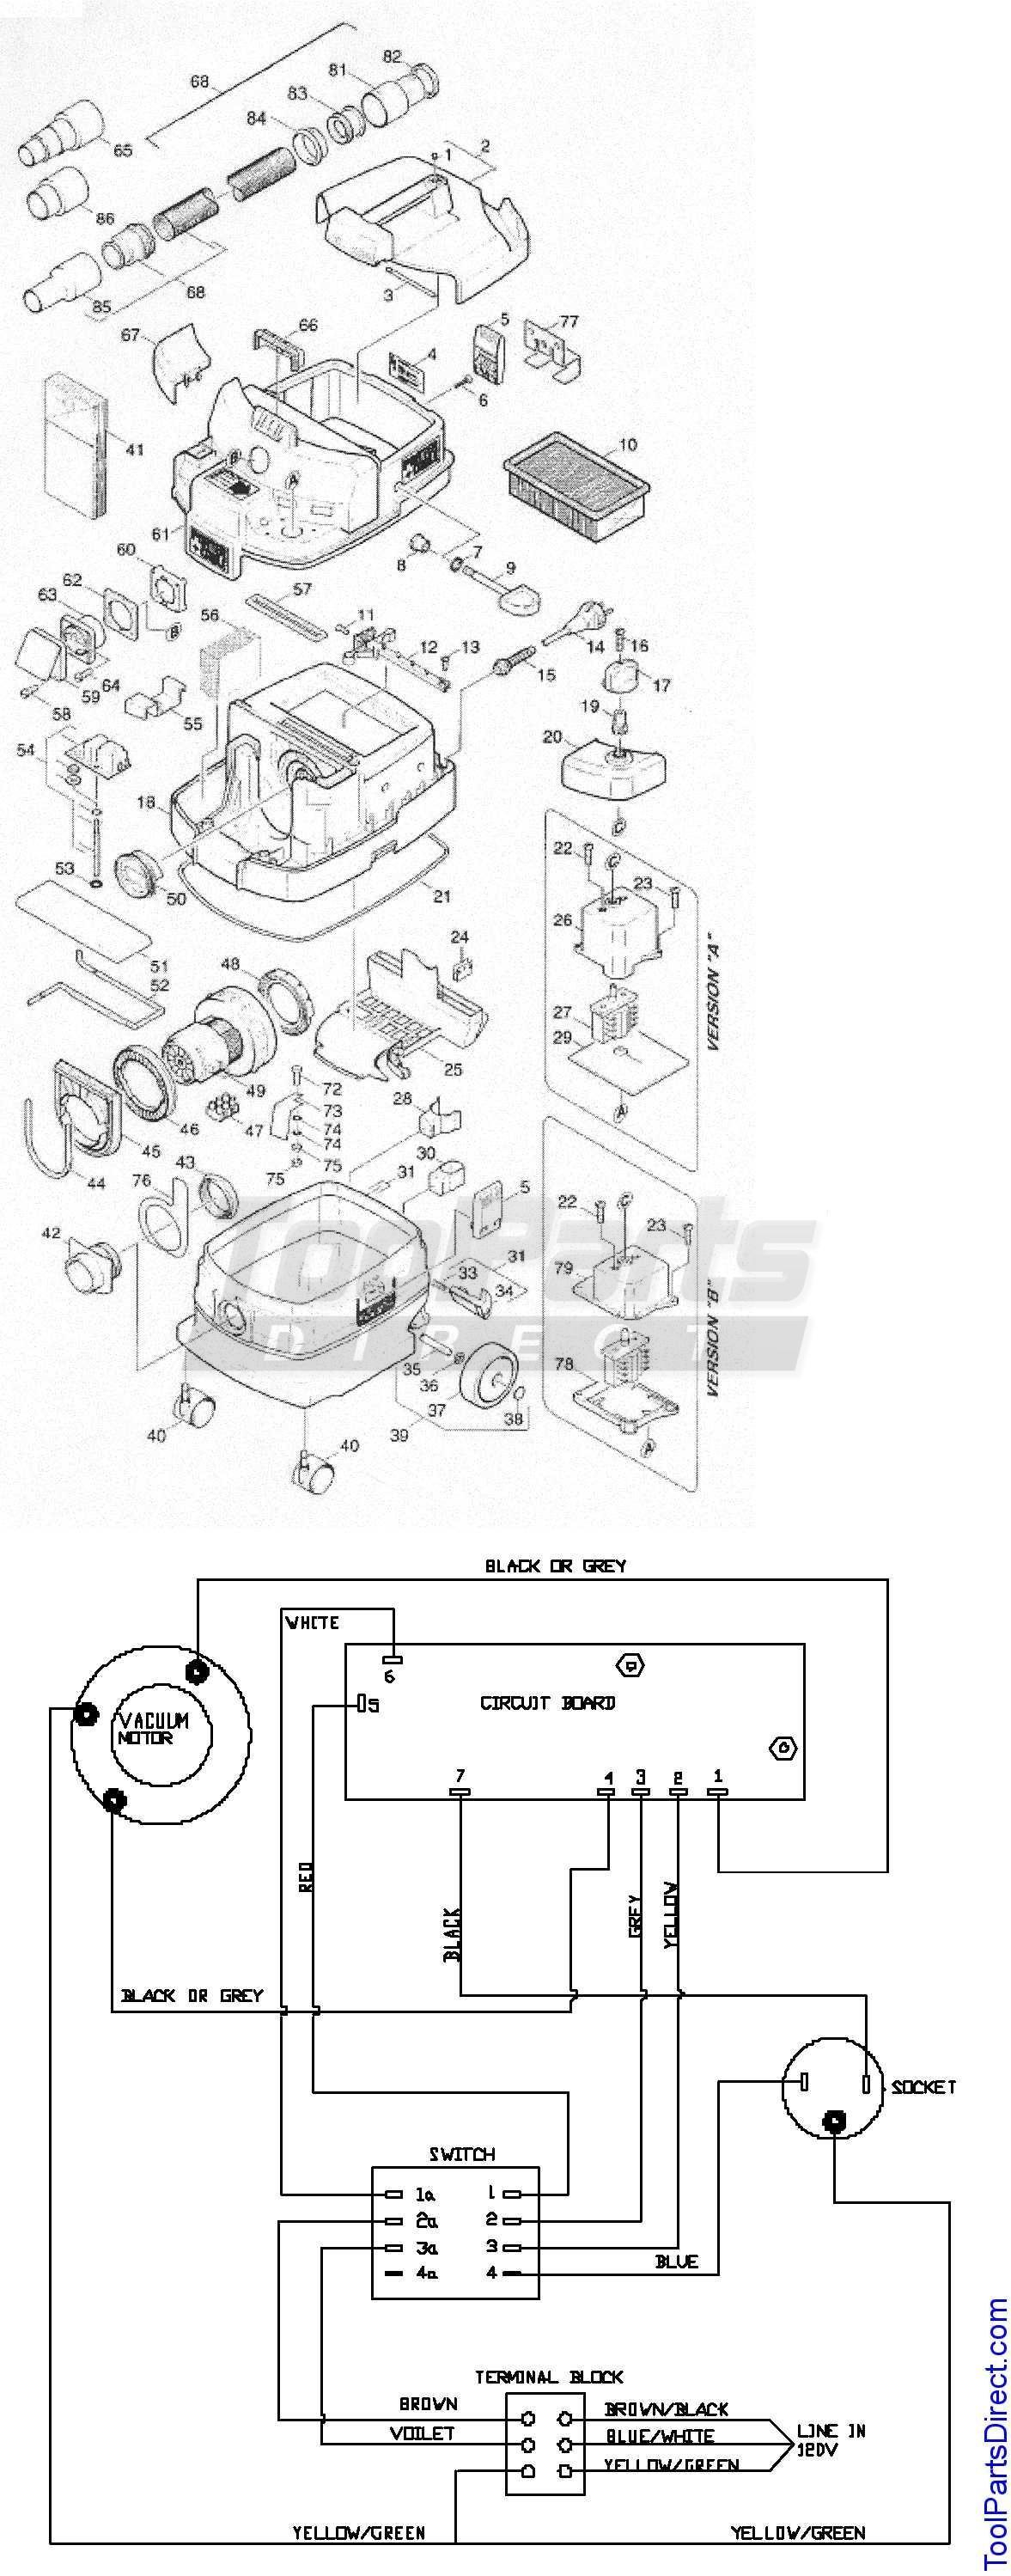 hight resolution of craftsman shop vac wiring diagram somurich com wiring oreck vacuum craftsman shop vac wiring diagram wiring